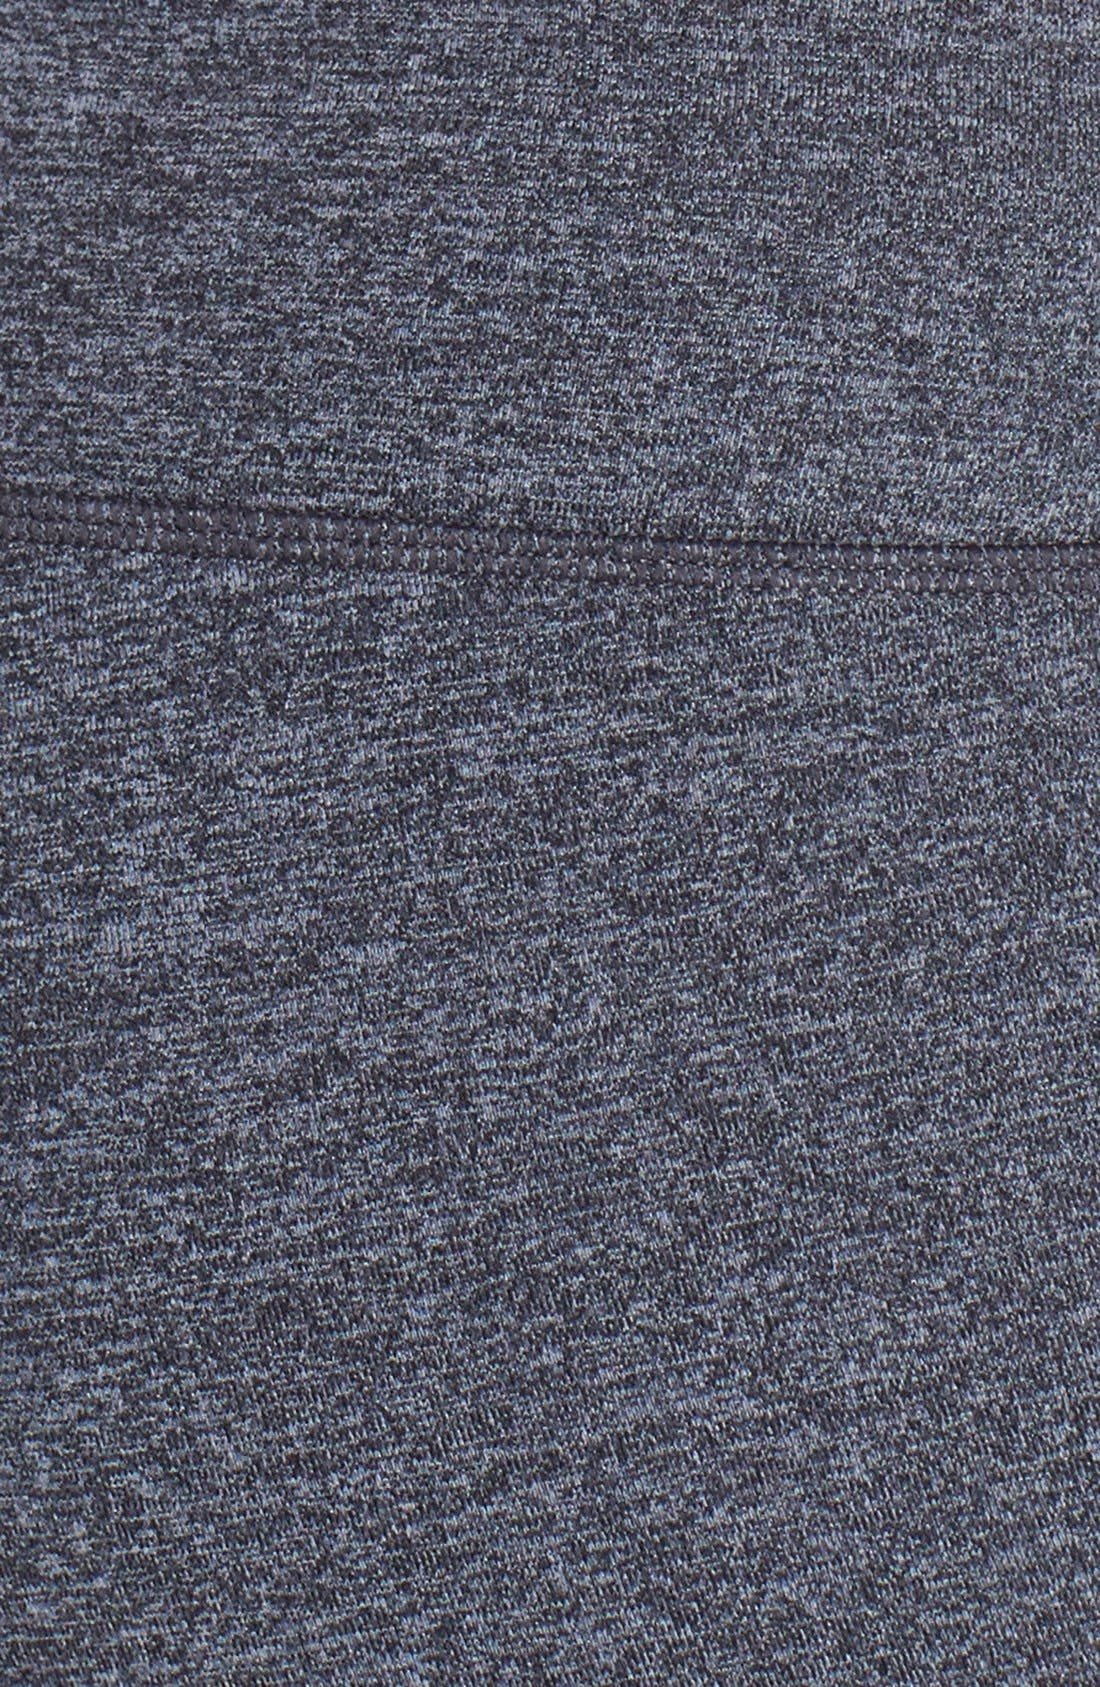 Alternate Image 4  - Zella 'Haute' Cross Dye Shorts